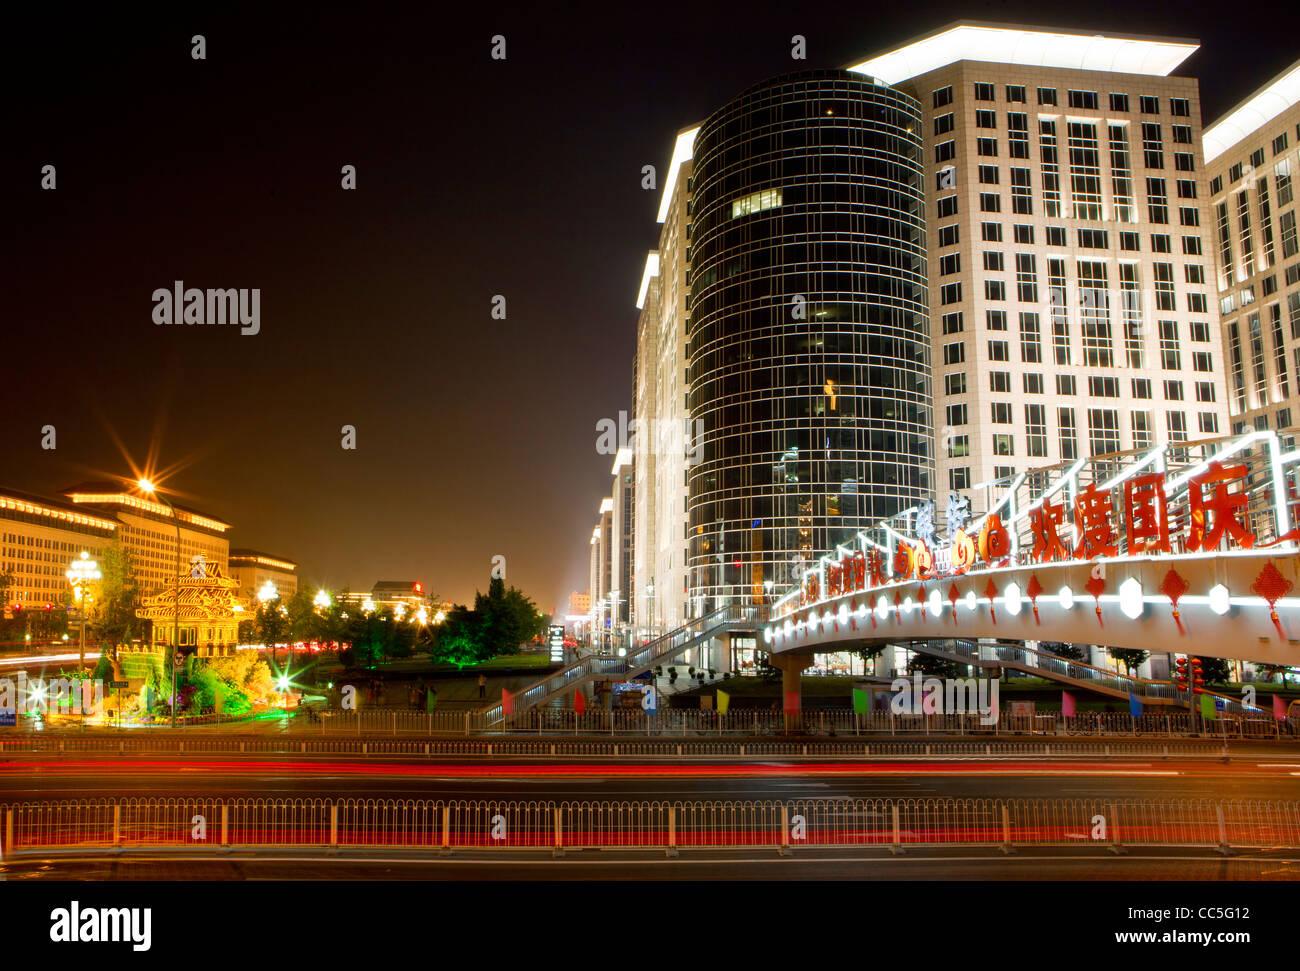 Oriental Plaza at night, Beijing, China - Stock Image